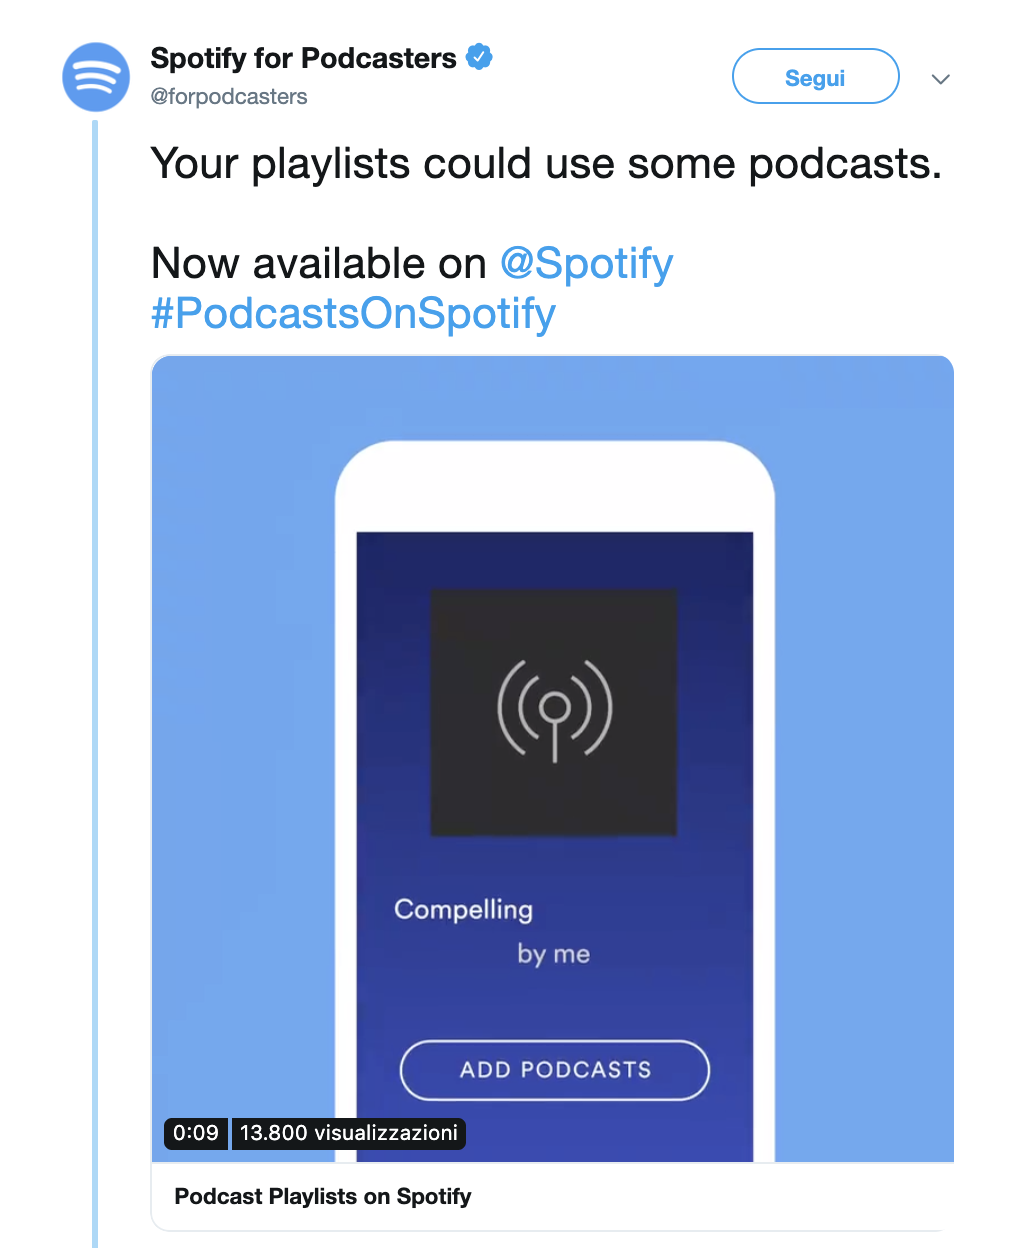 Spotify podcast playlist